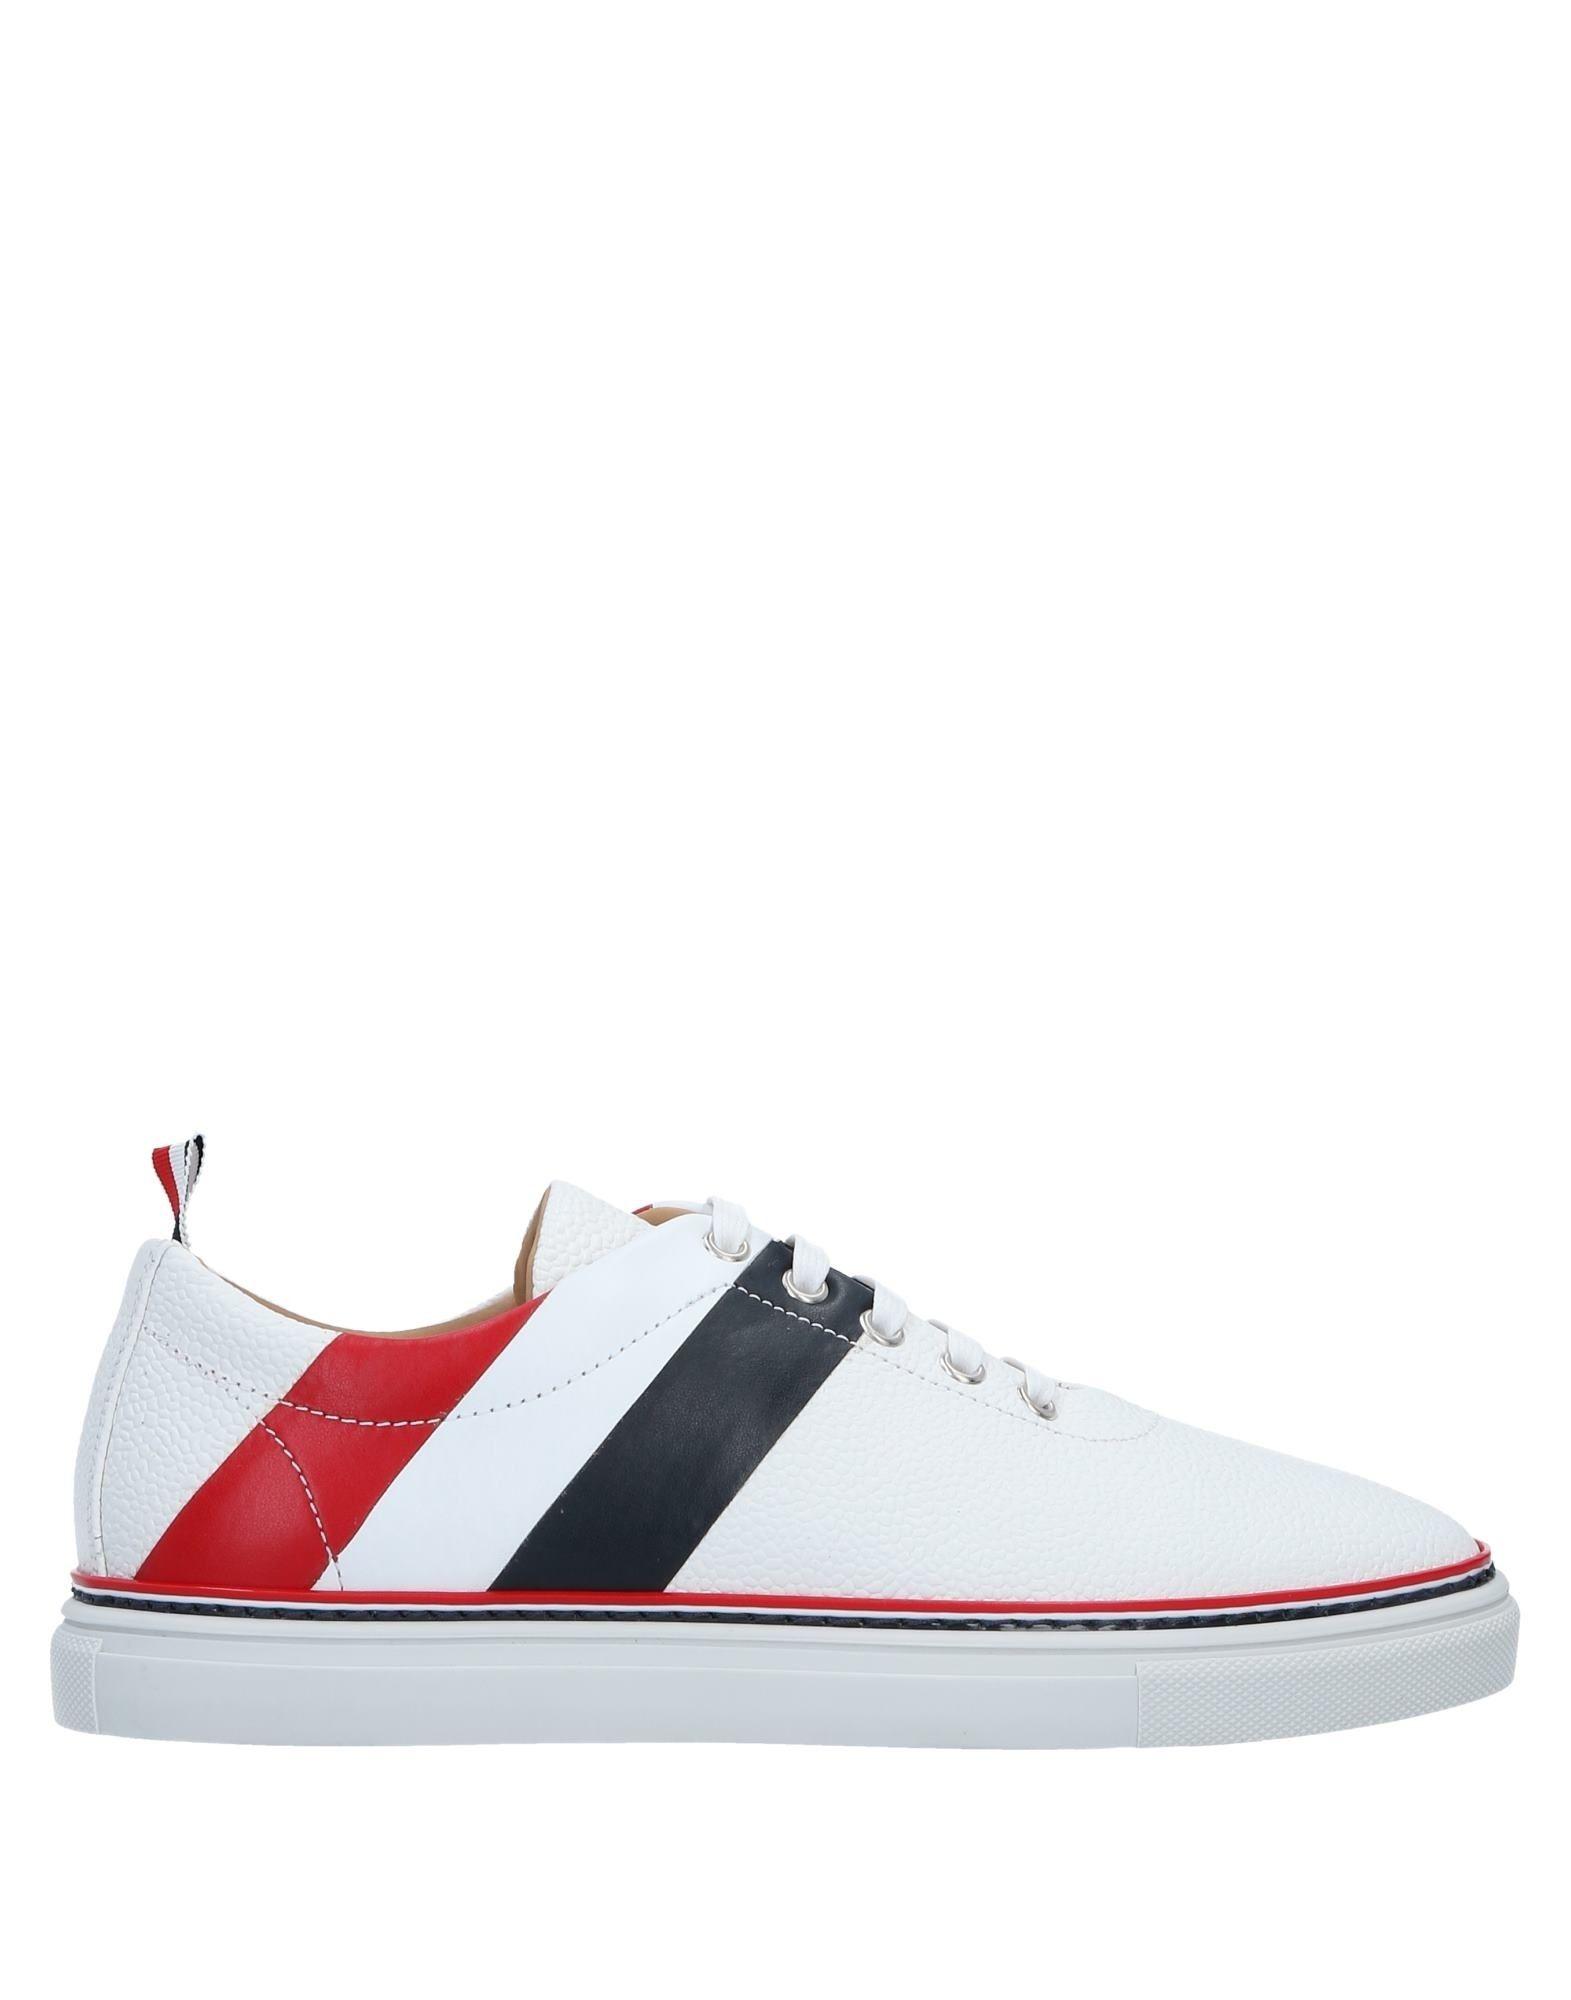 Thom Browne Sneakers Damen  11500561CWGünstige gut aussehende Schuhe